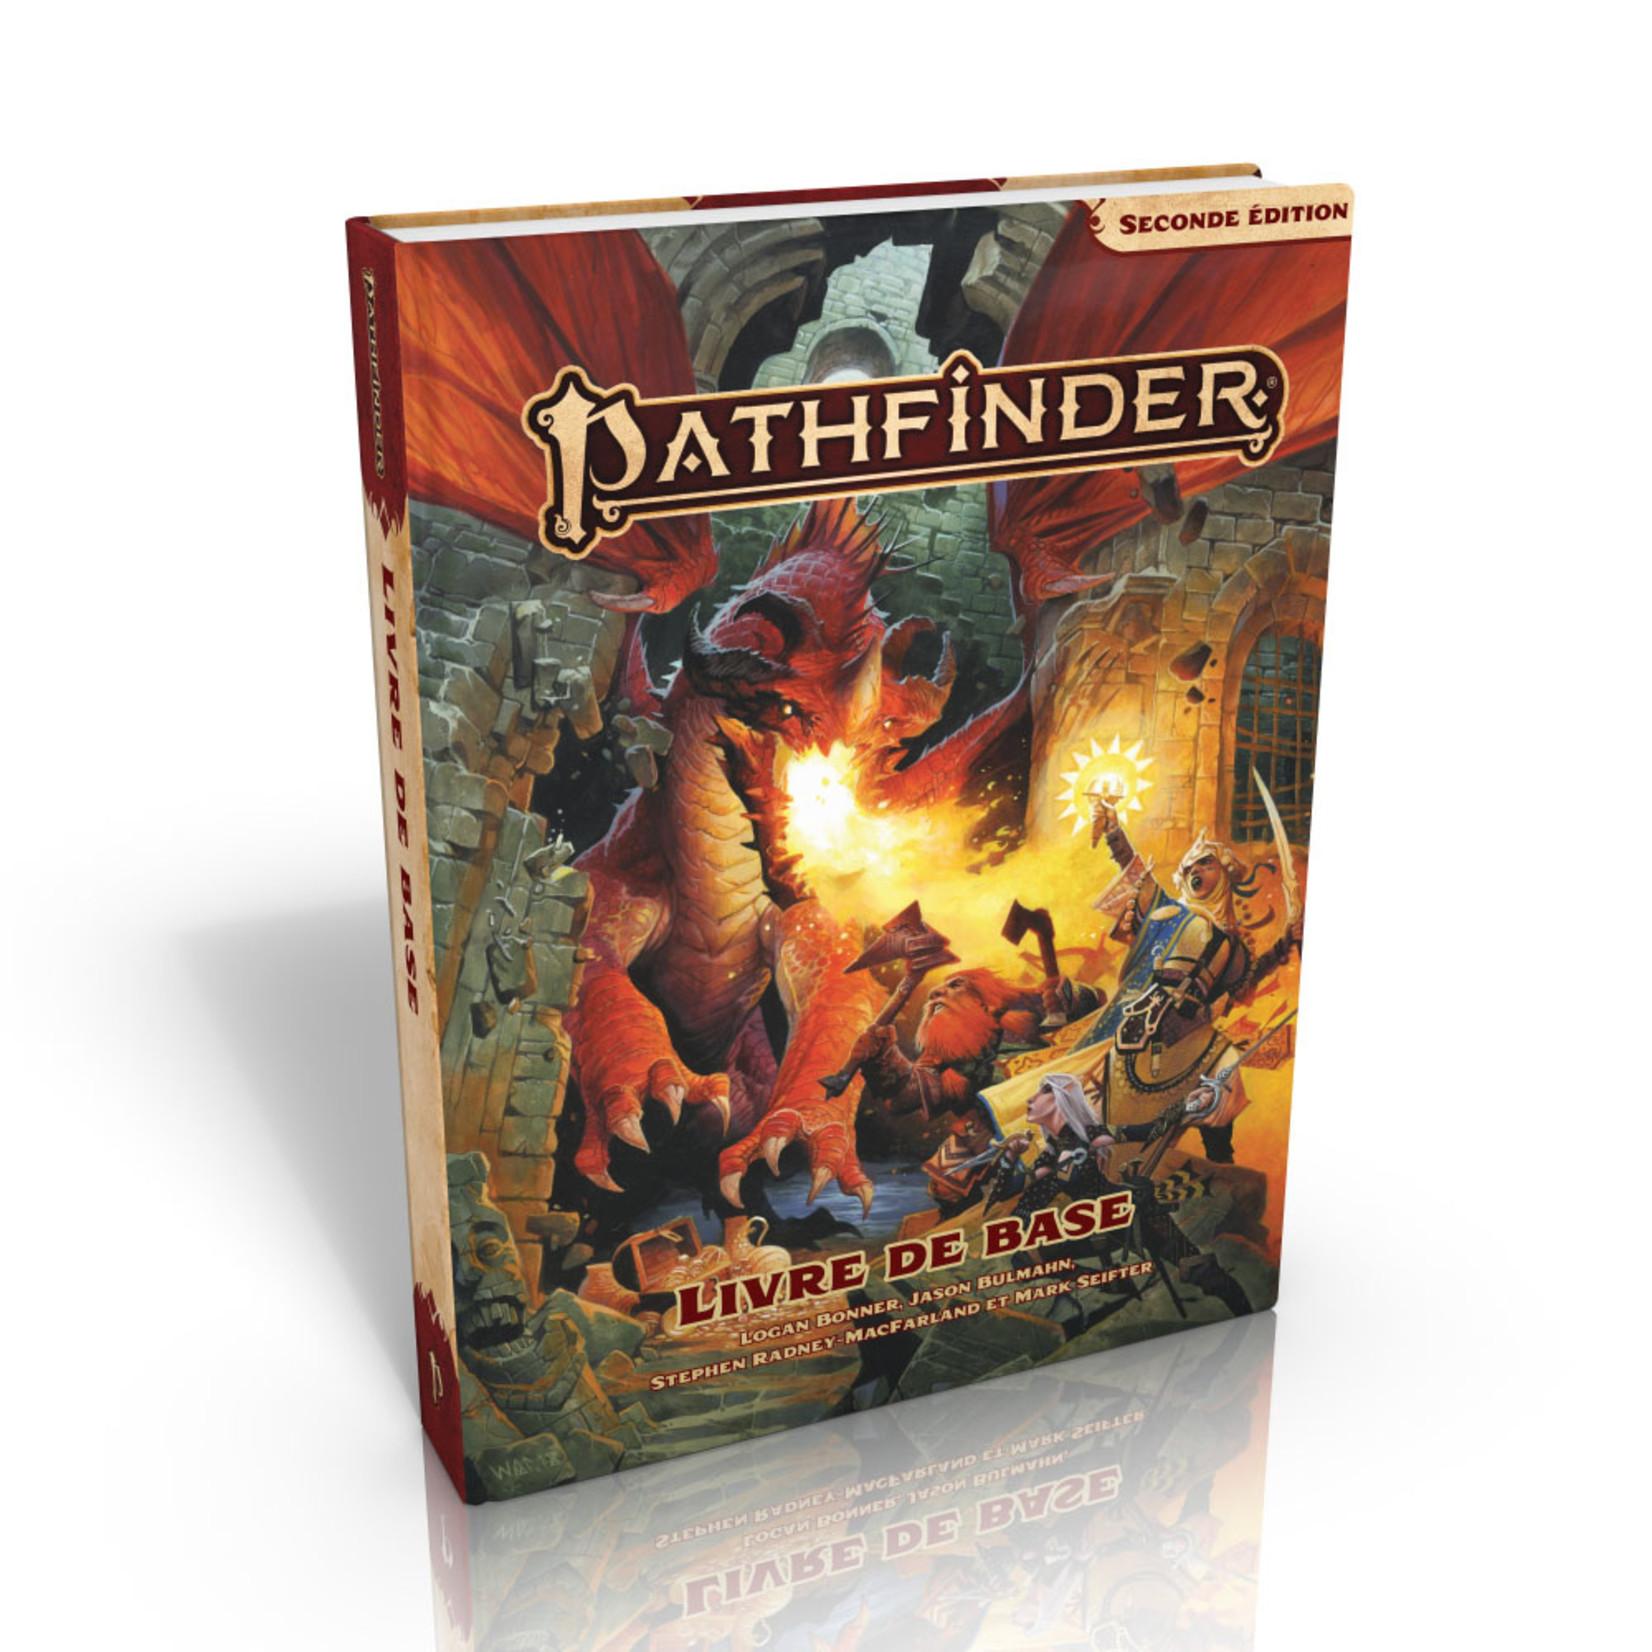 Paizo Pathfinder 2 Livre de base (French)